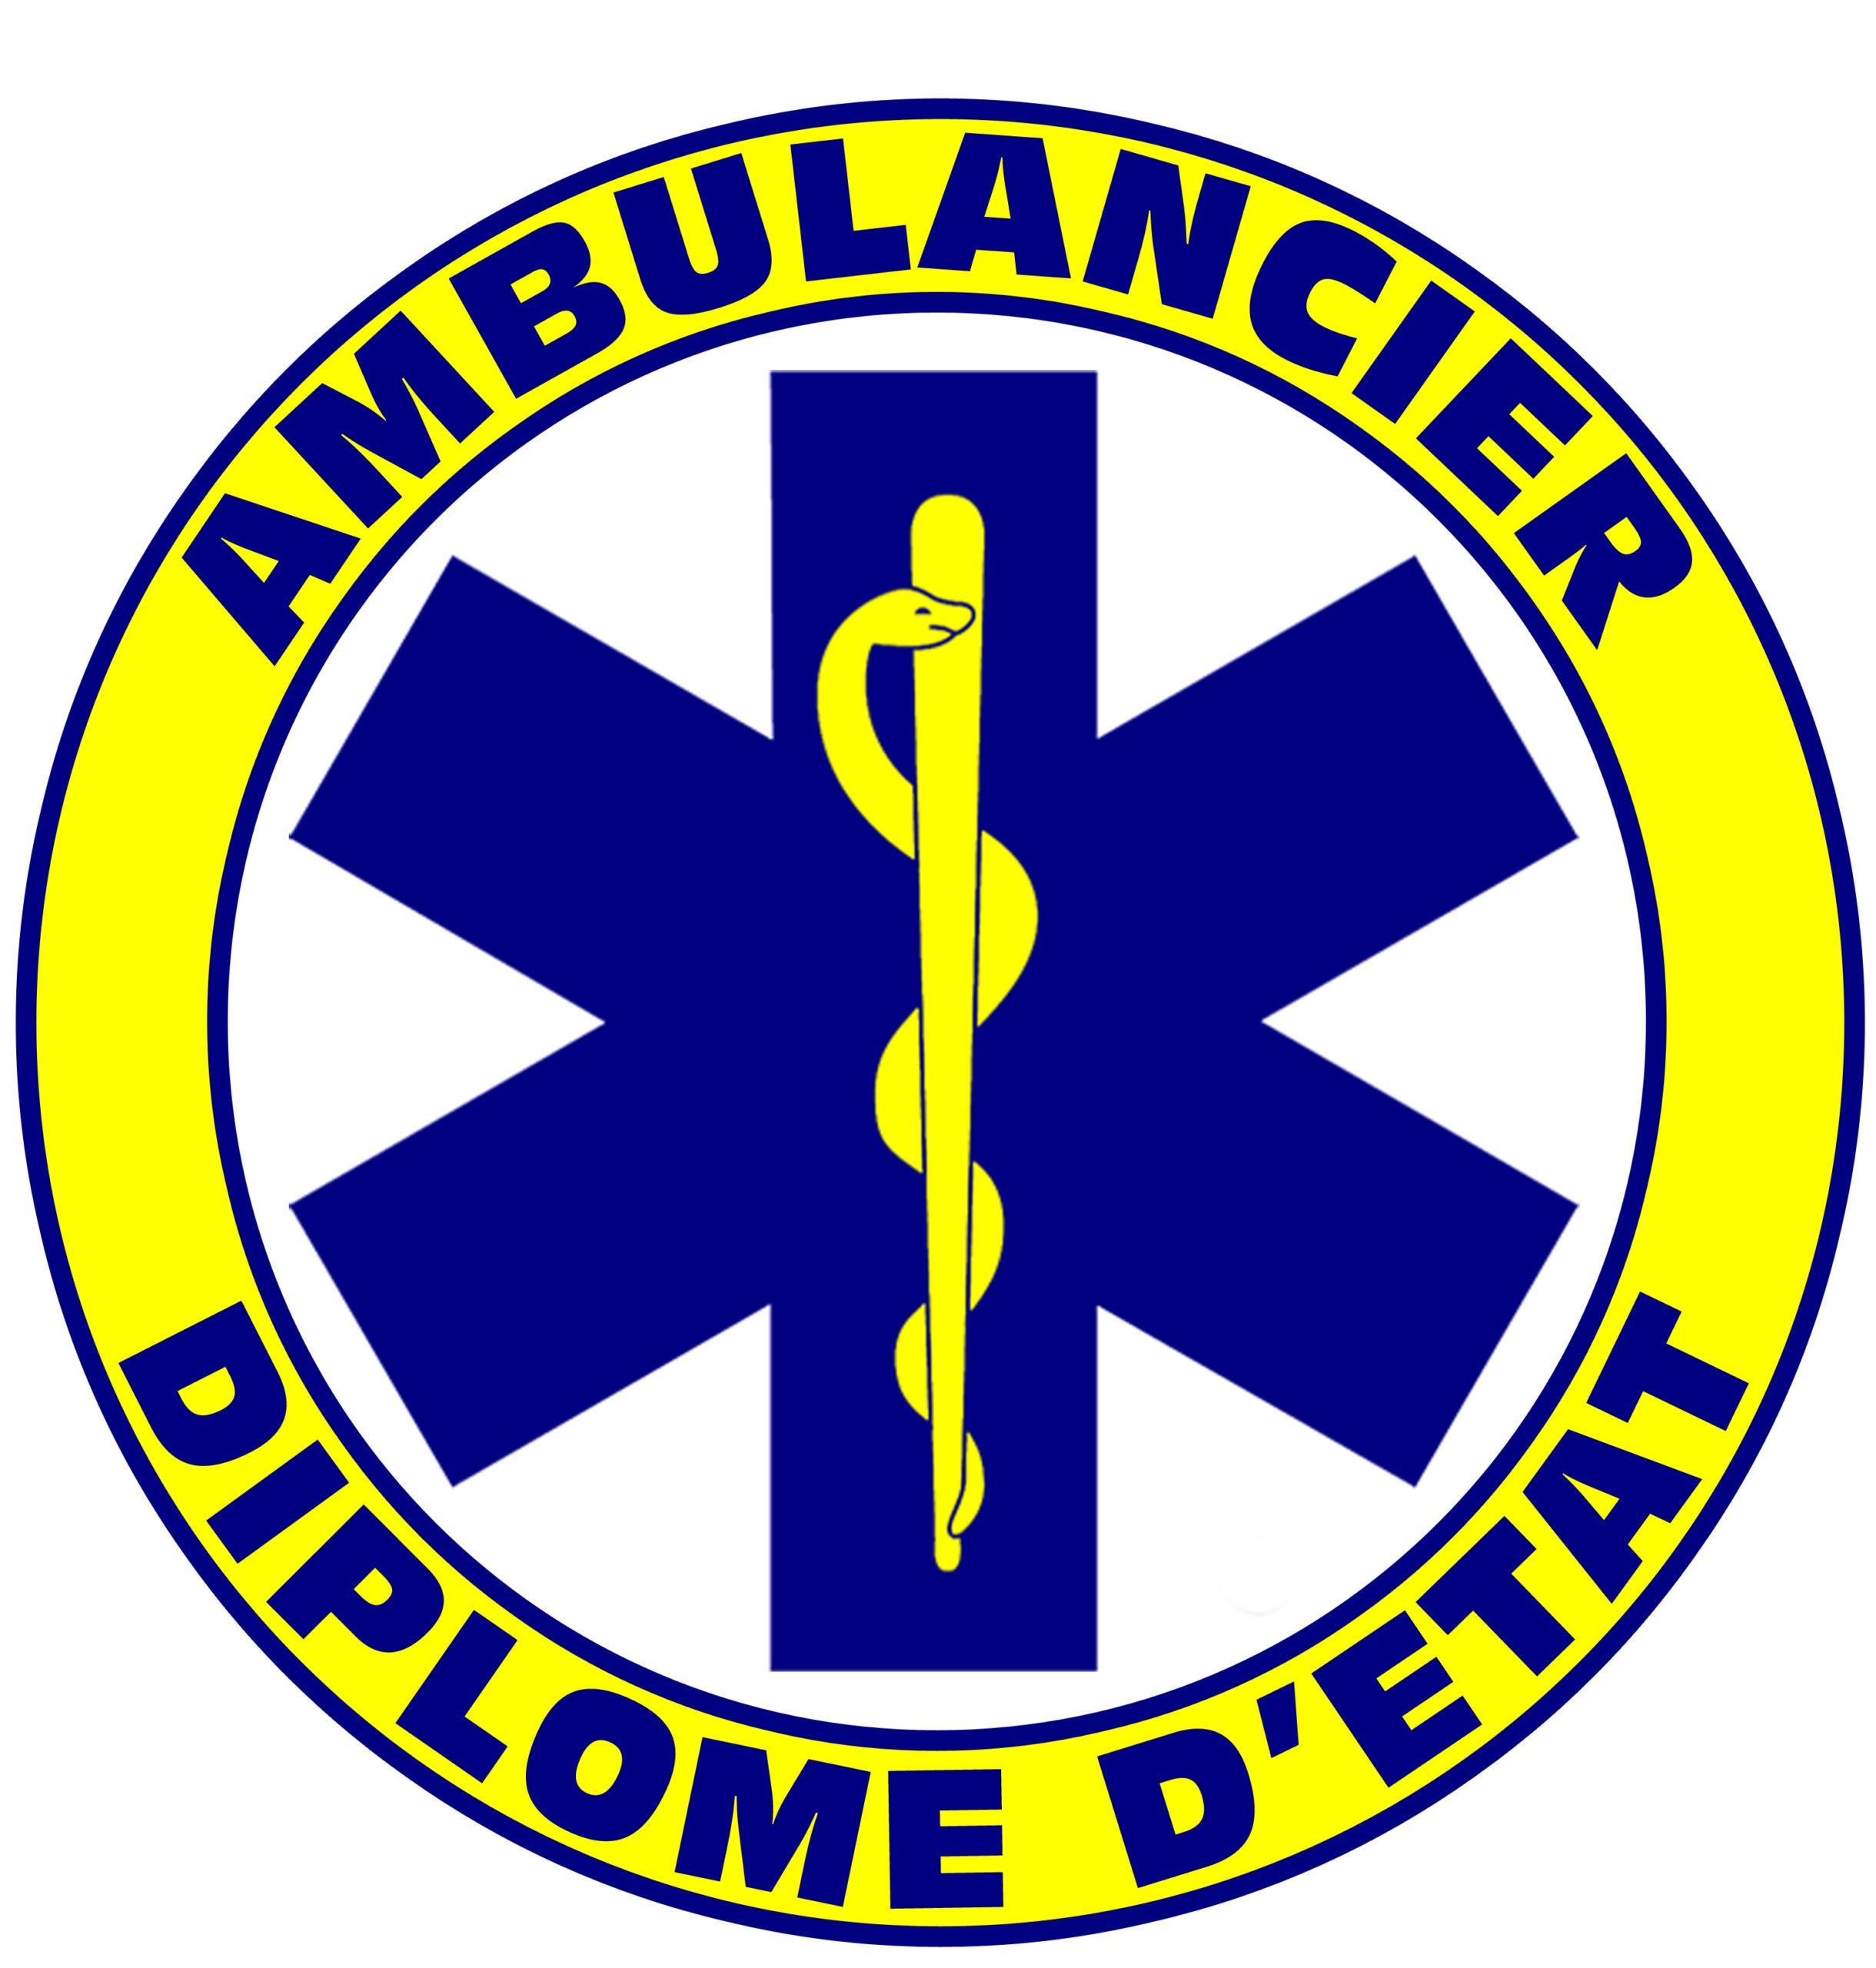 Ambulancier Diplômé d'Etat